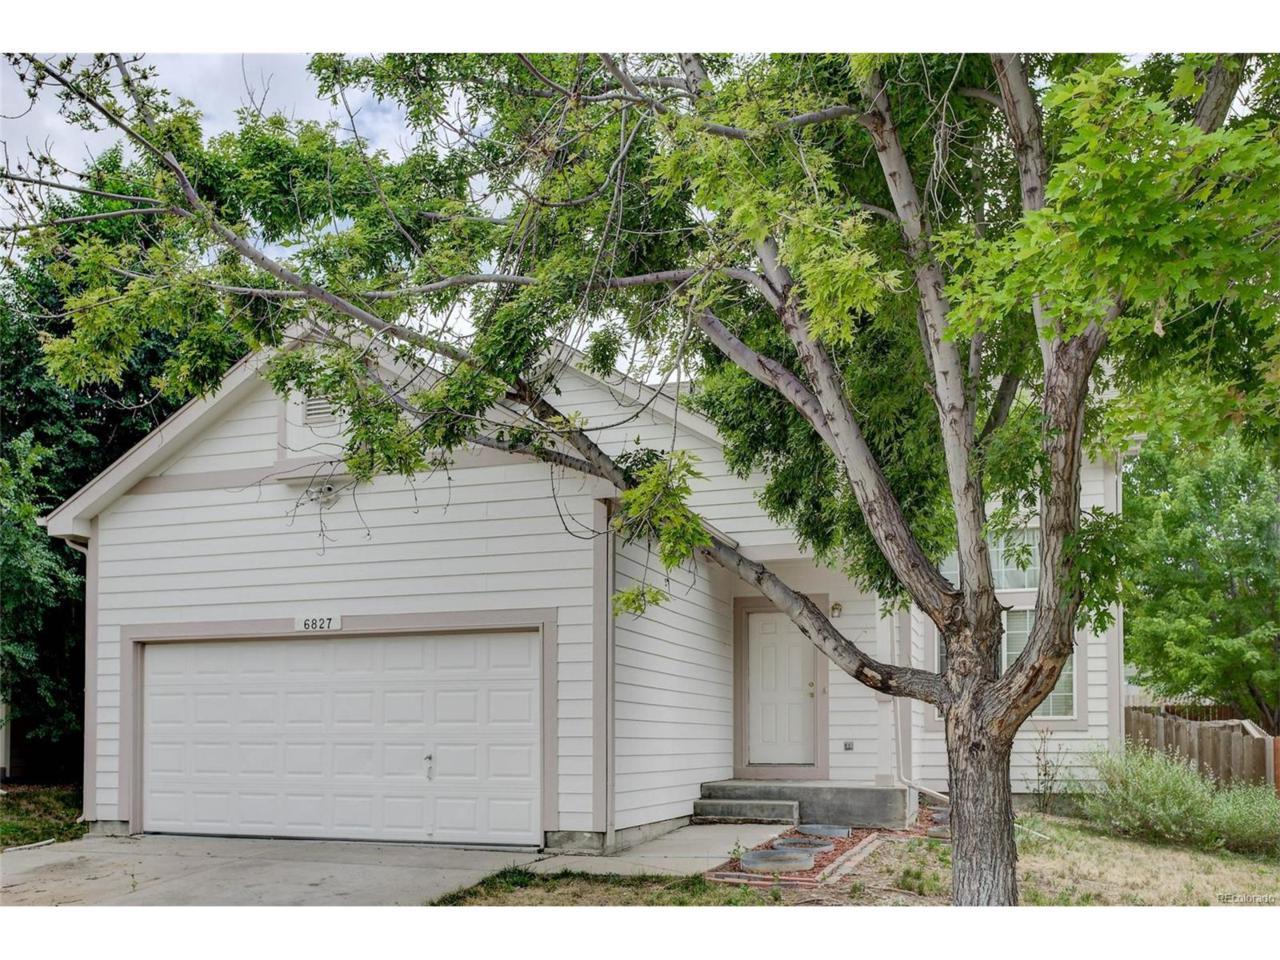 6827 Summerset Avenue, Longmont, CO 80504 (MLS #8243664) :: 8z Real Estate